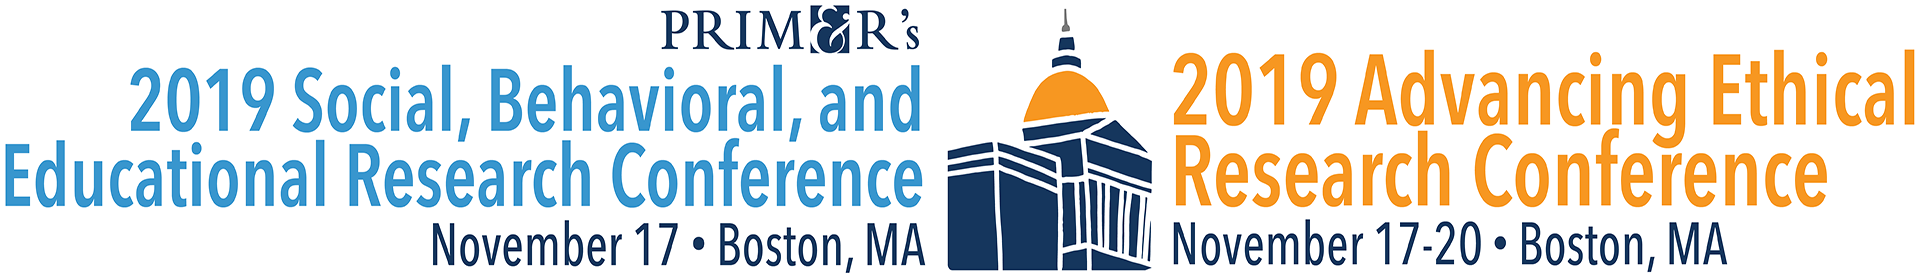 AER 2019 Event Banner